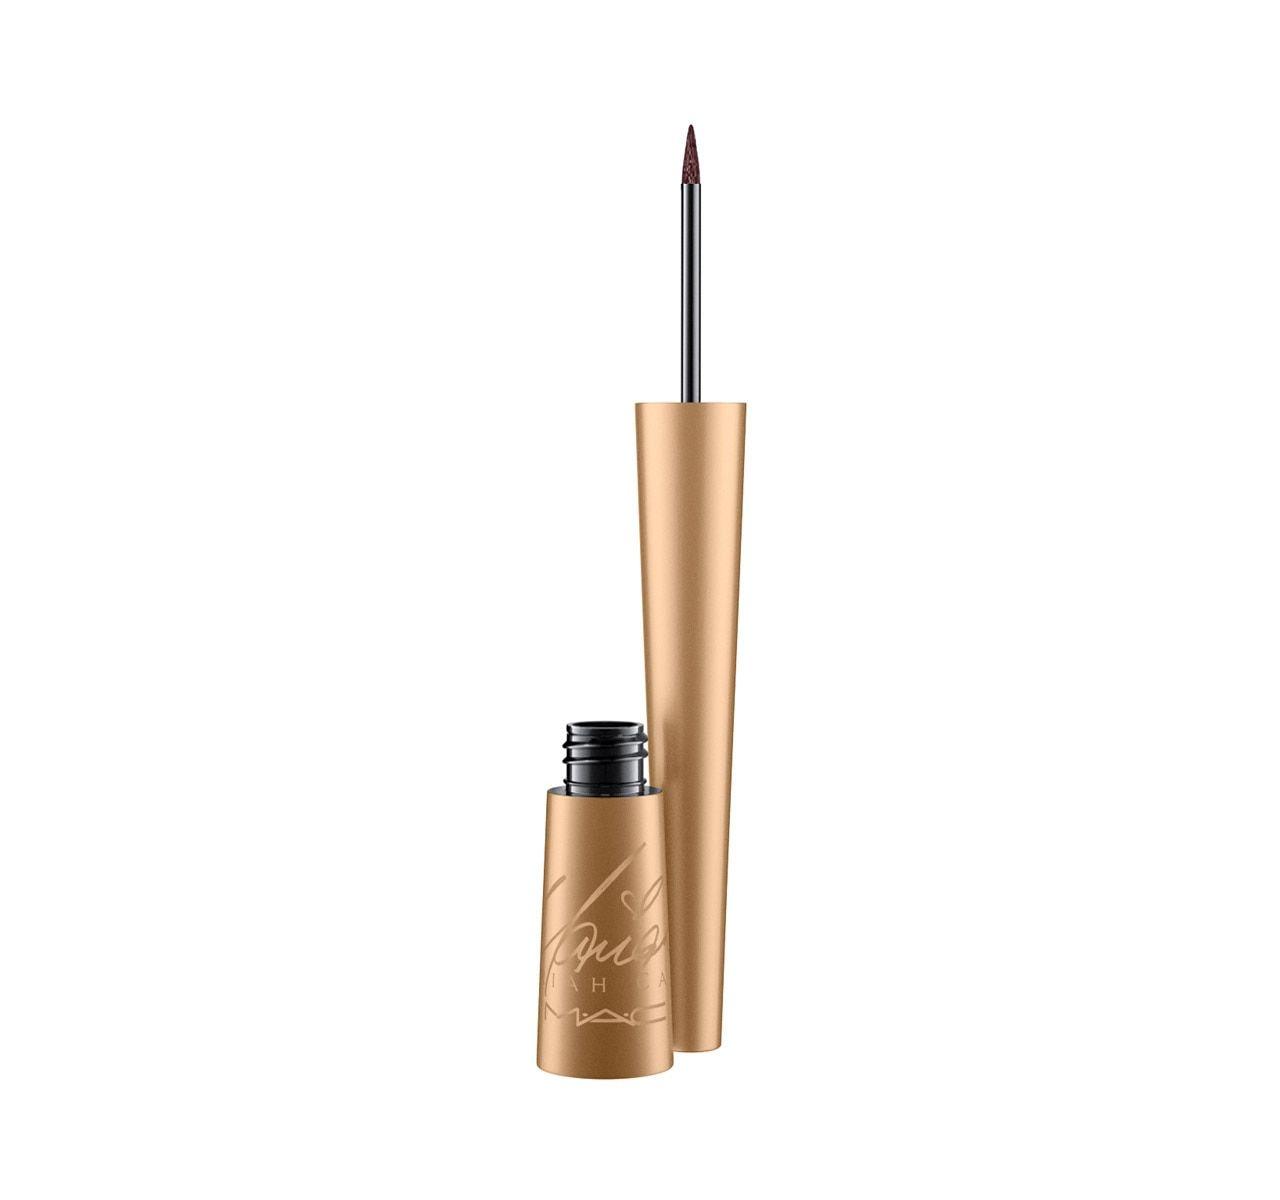 210 Precise Eye Liner Brush by MAC #18